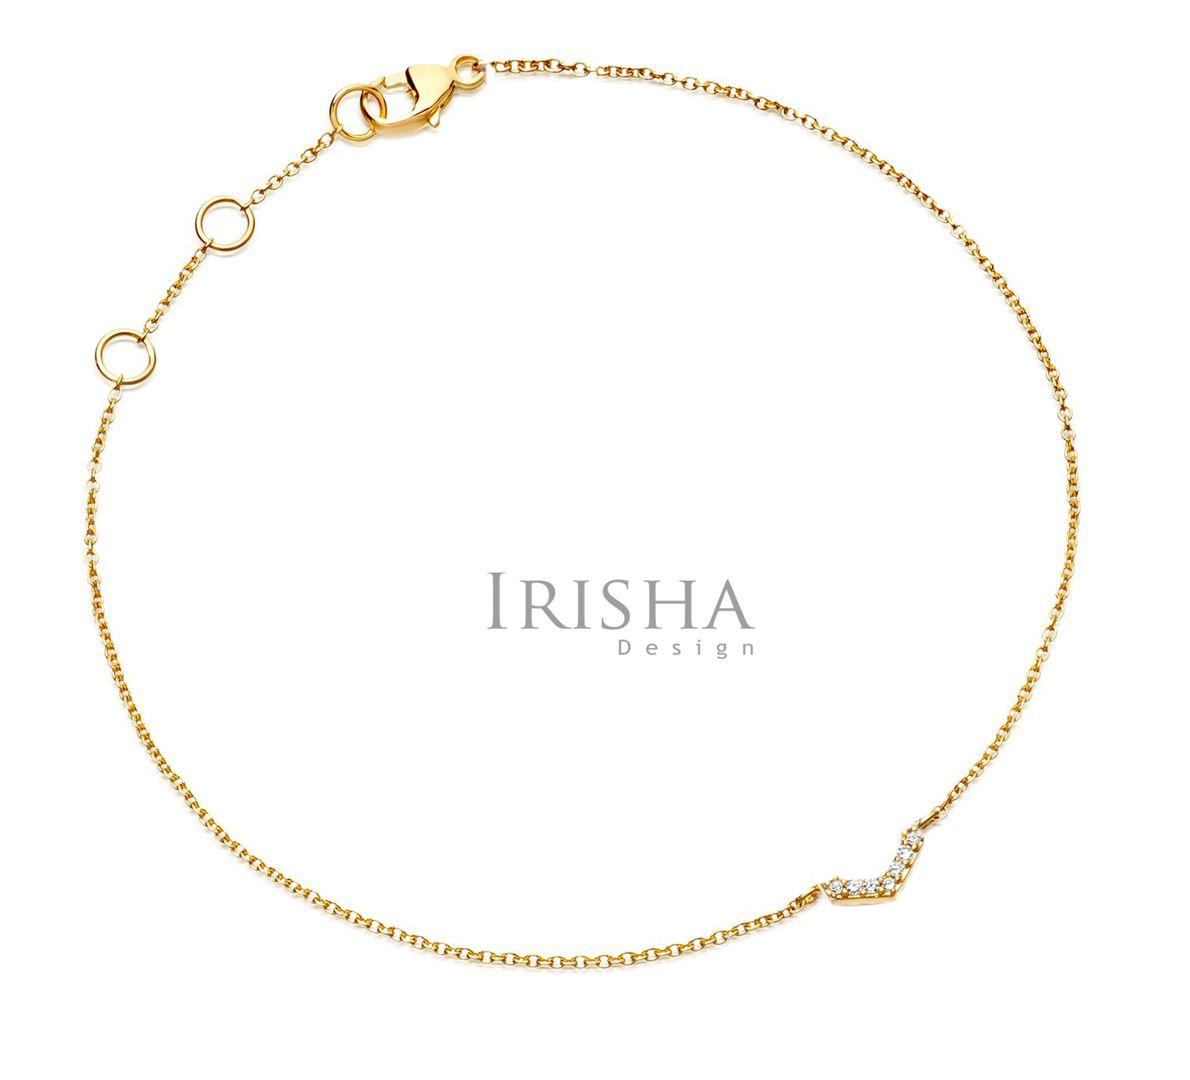 VS Clarity 0.04 Ct. Genuine Diamond Half Honeycomb Chain Bracelet 14K Gold